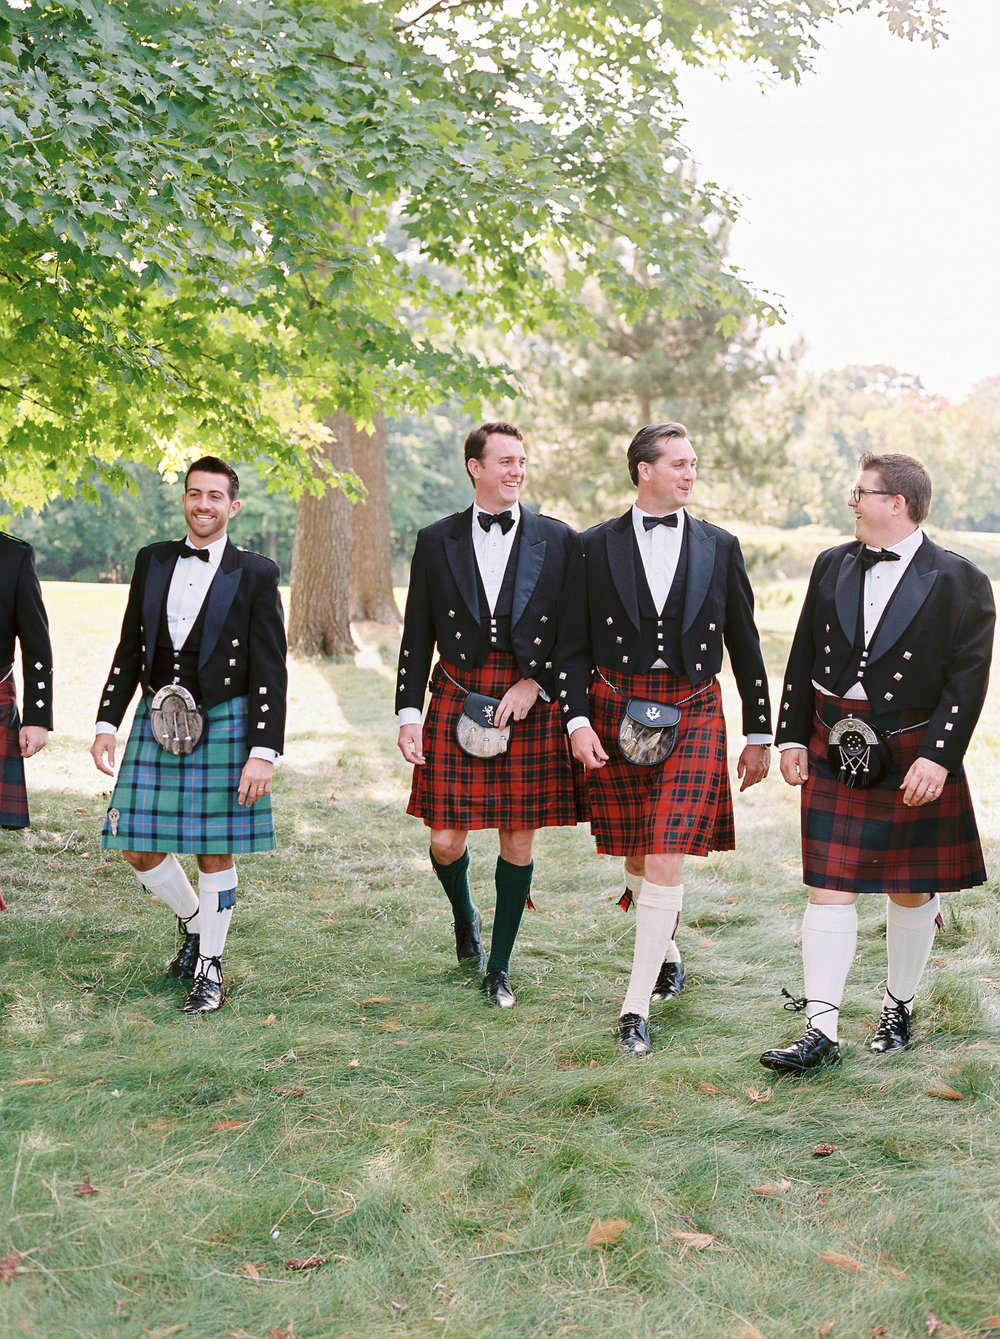 0173-Geneva-Ian-Wedding-Toronto Golf Club-When He Found Her-TorontoPhotographer.jpg